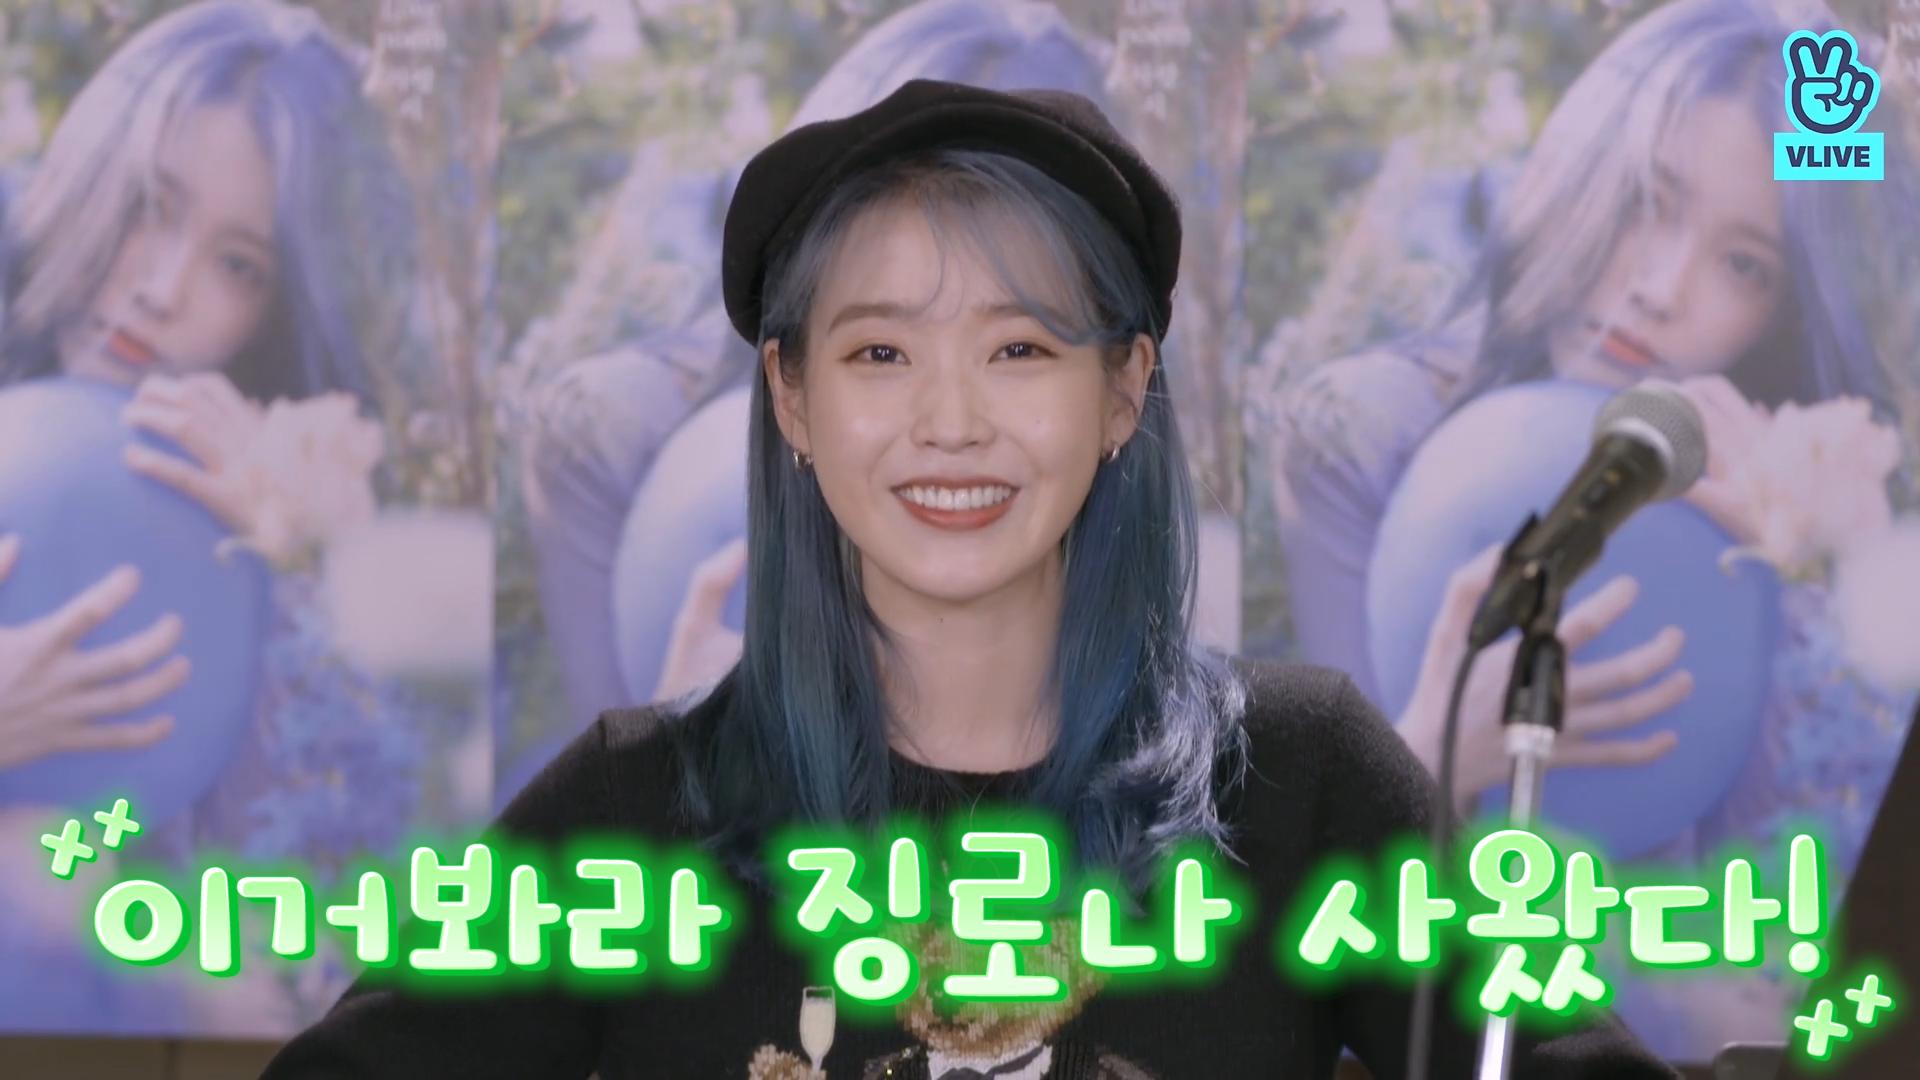 [IU] 띄어쓰기없이보낼게올때징로나,,🍈🍦(IU's concert episode with Yoo In na)